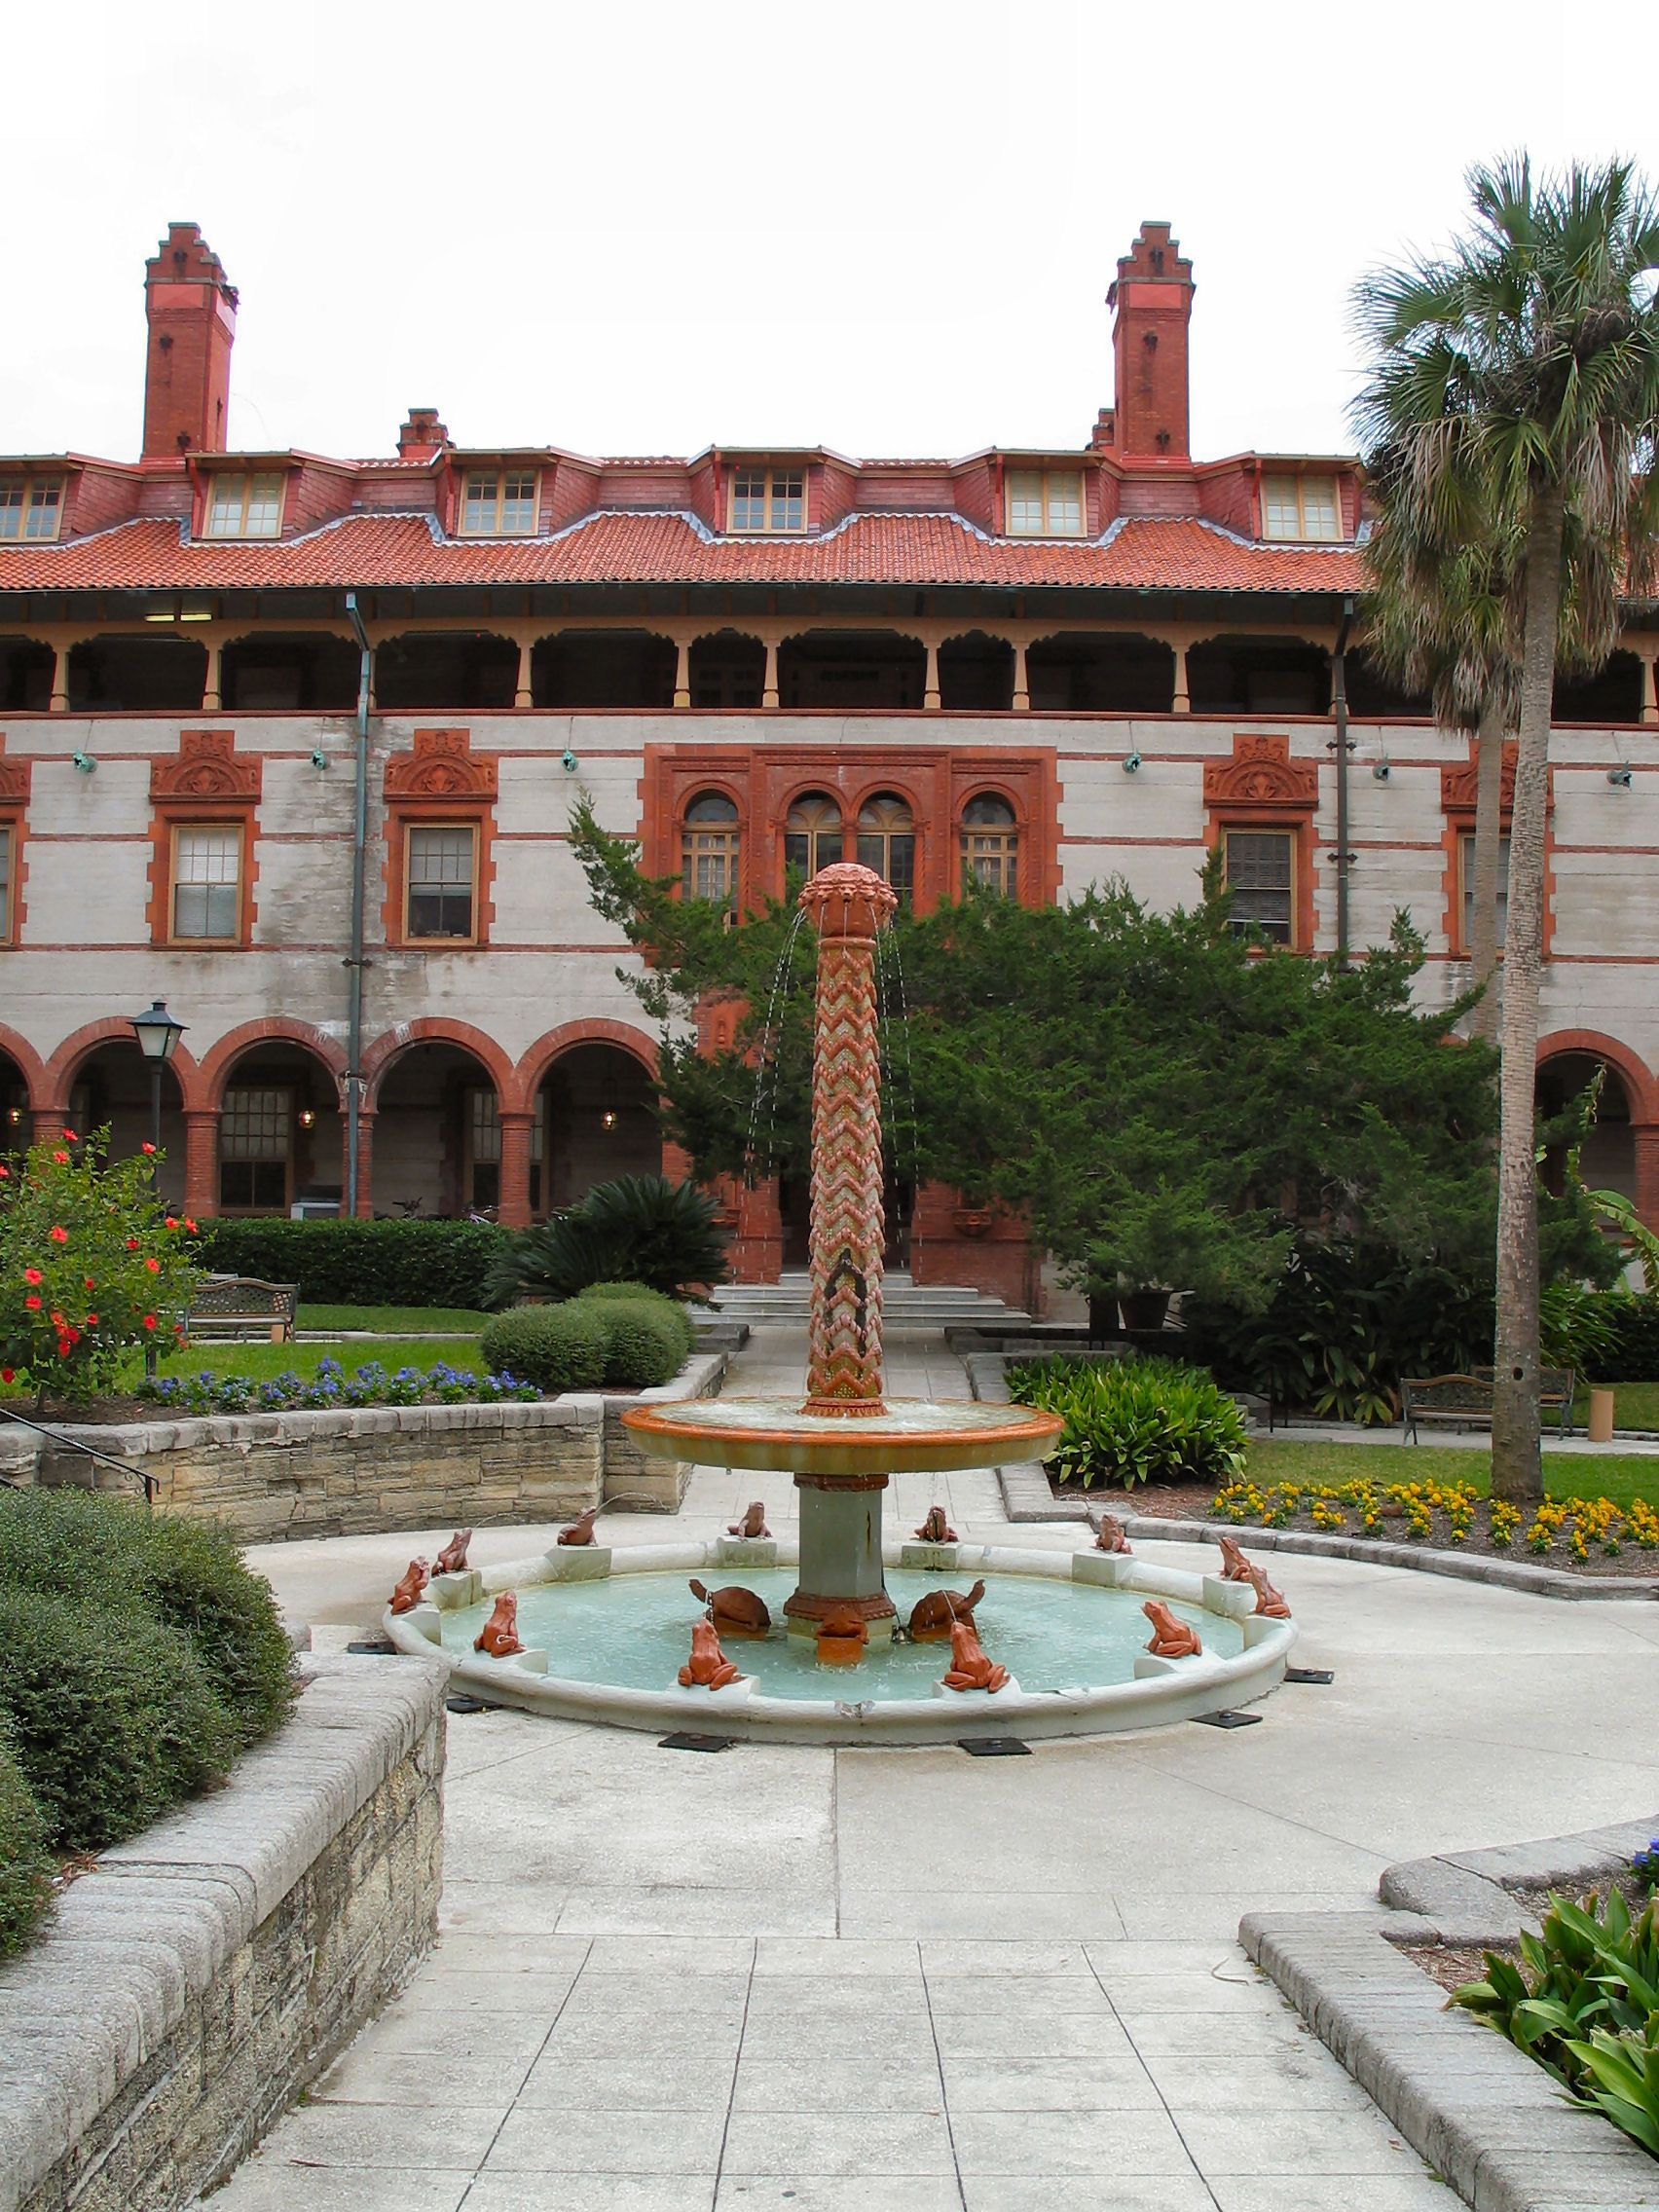 Flagler College Trip To Halloween Horror Nights 2020 Flagler College Fountain | House styles, Flagler, Florida